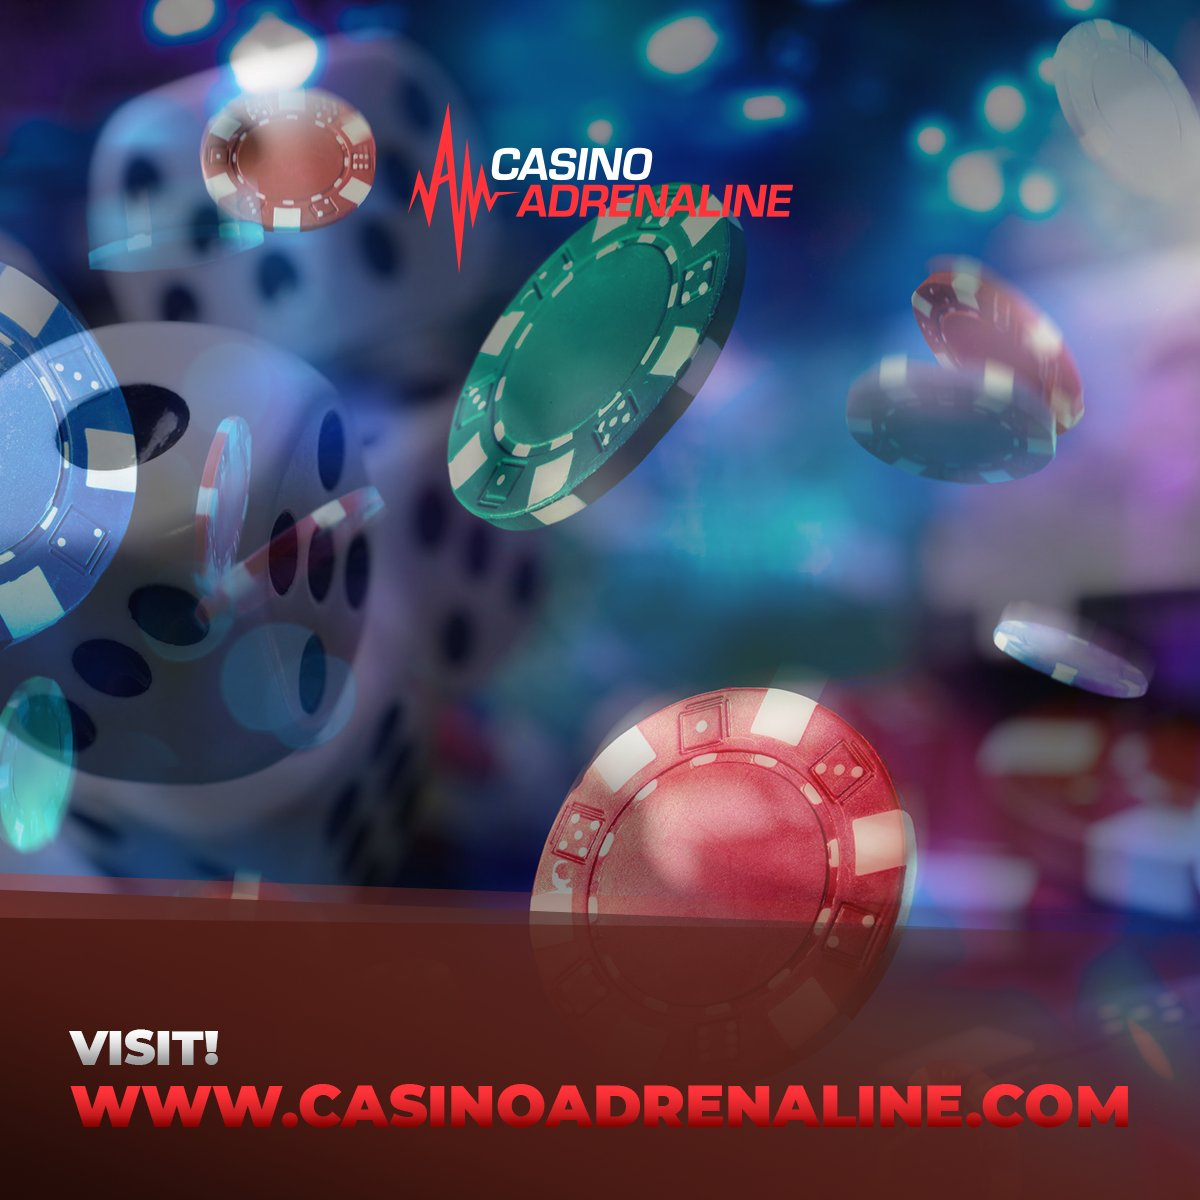 test Twitter Media - Check out our Loyalty program! Convert your loyalty points to real cash! 🤑😁😎#CasinoAdrenaline #TotalJackpot #CasinoAdrenalingaming #casinos #slot #casinoluck #enjoythegame  Visit: https://t.co/oSXfIB6U5E https://t.co/qeOeImY9TN